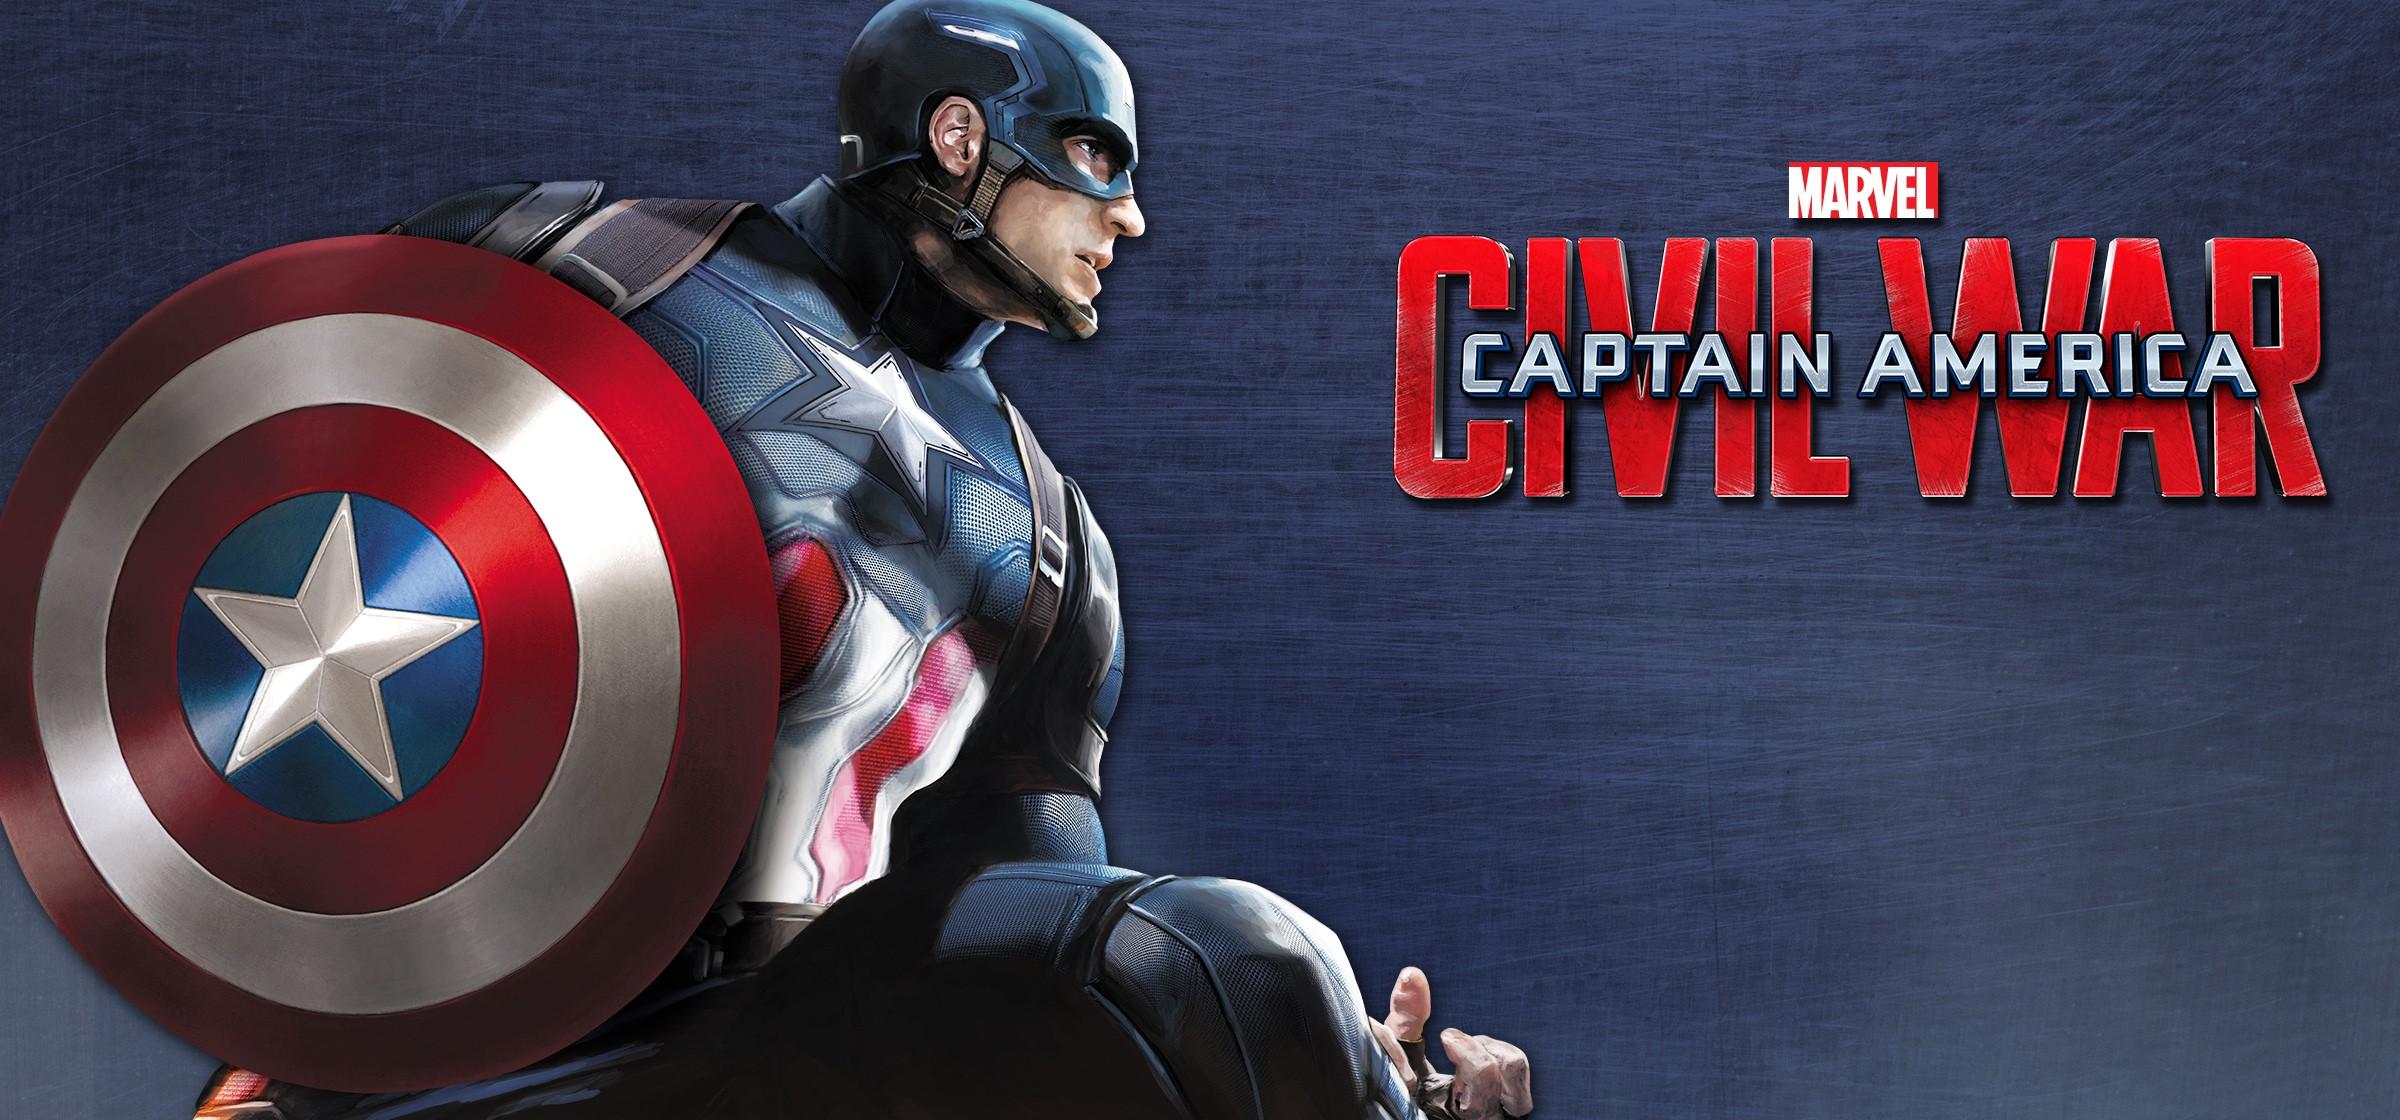 ihome captain america target